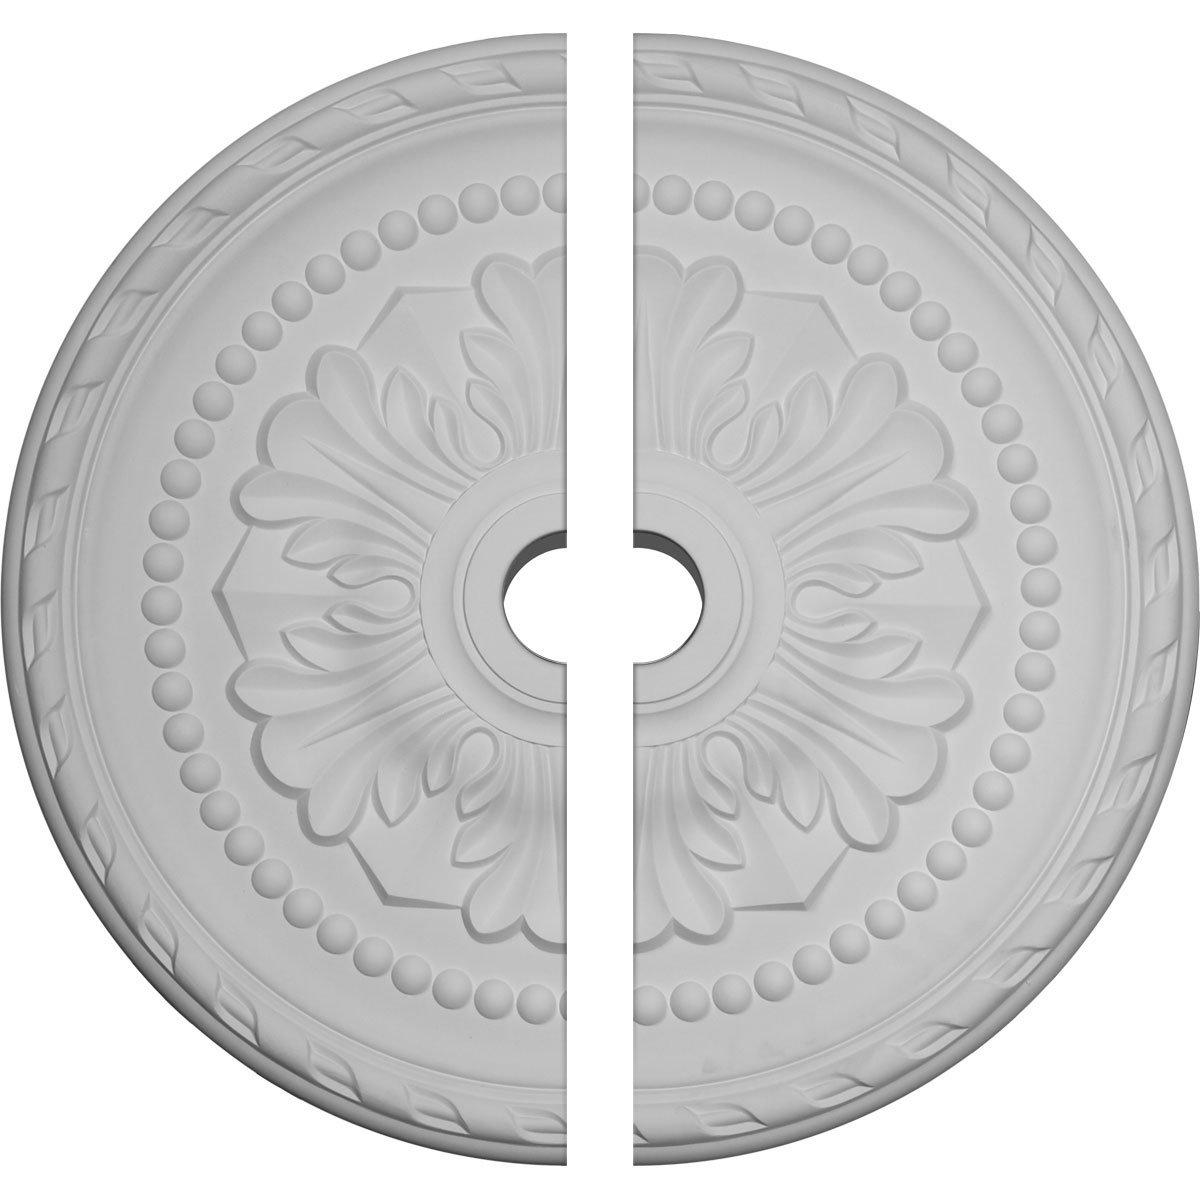 Ekena Millwork CM31PM2 31 1/2''OD x 3 5/8''ID x 1 3/4''P Palmetto Ceiling Medallion, Fits Canopies up to 7-5/8'', 2 Piece